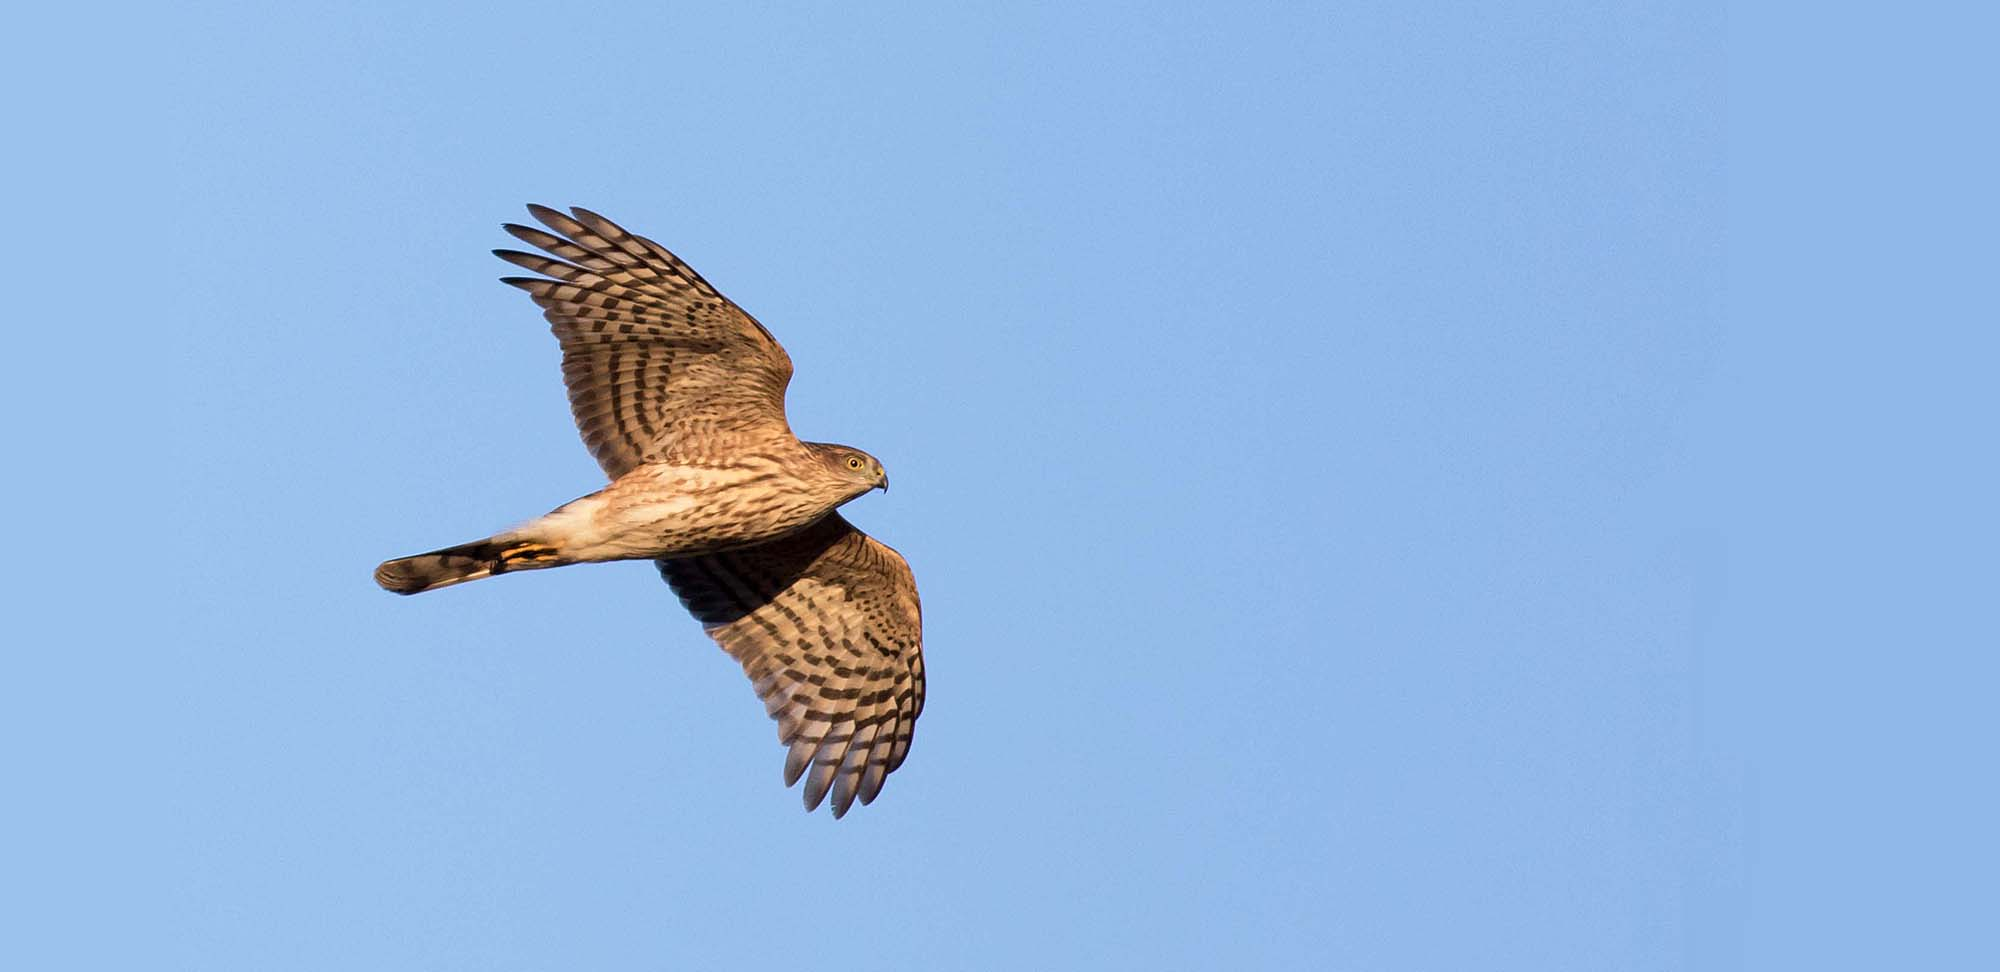 Sharp-shinned Hawk Field Guides Birding Tours VIRGINIA USA